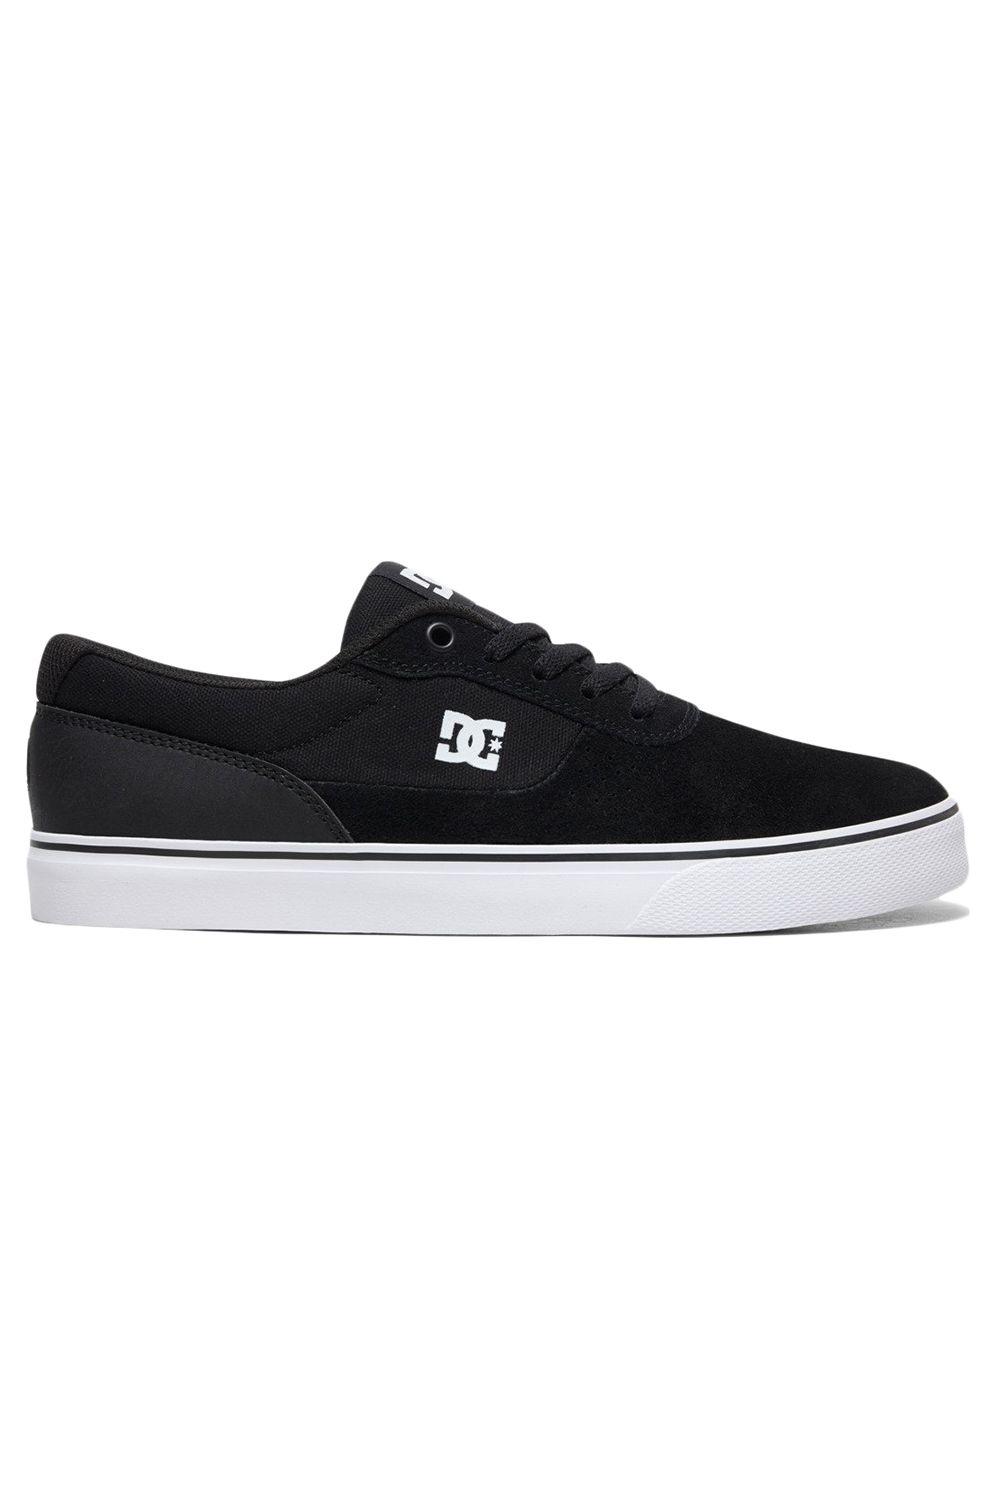 Tenis DC Shoes SWITCH S Black/Black/White